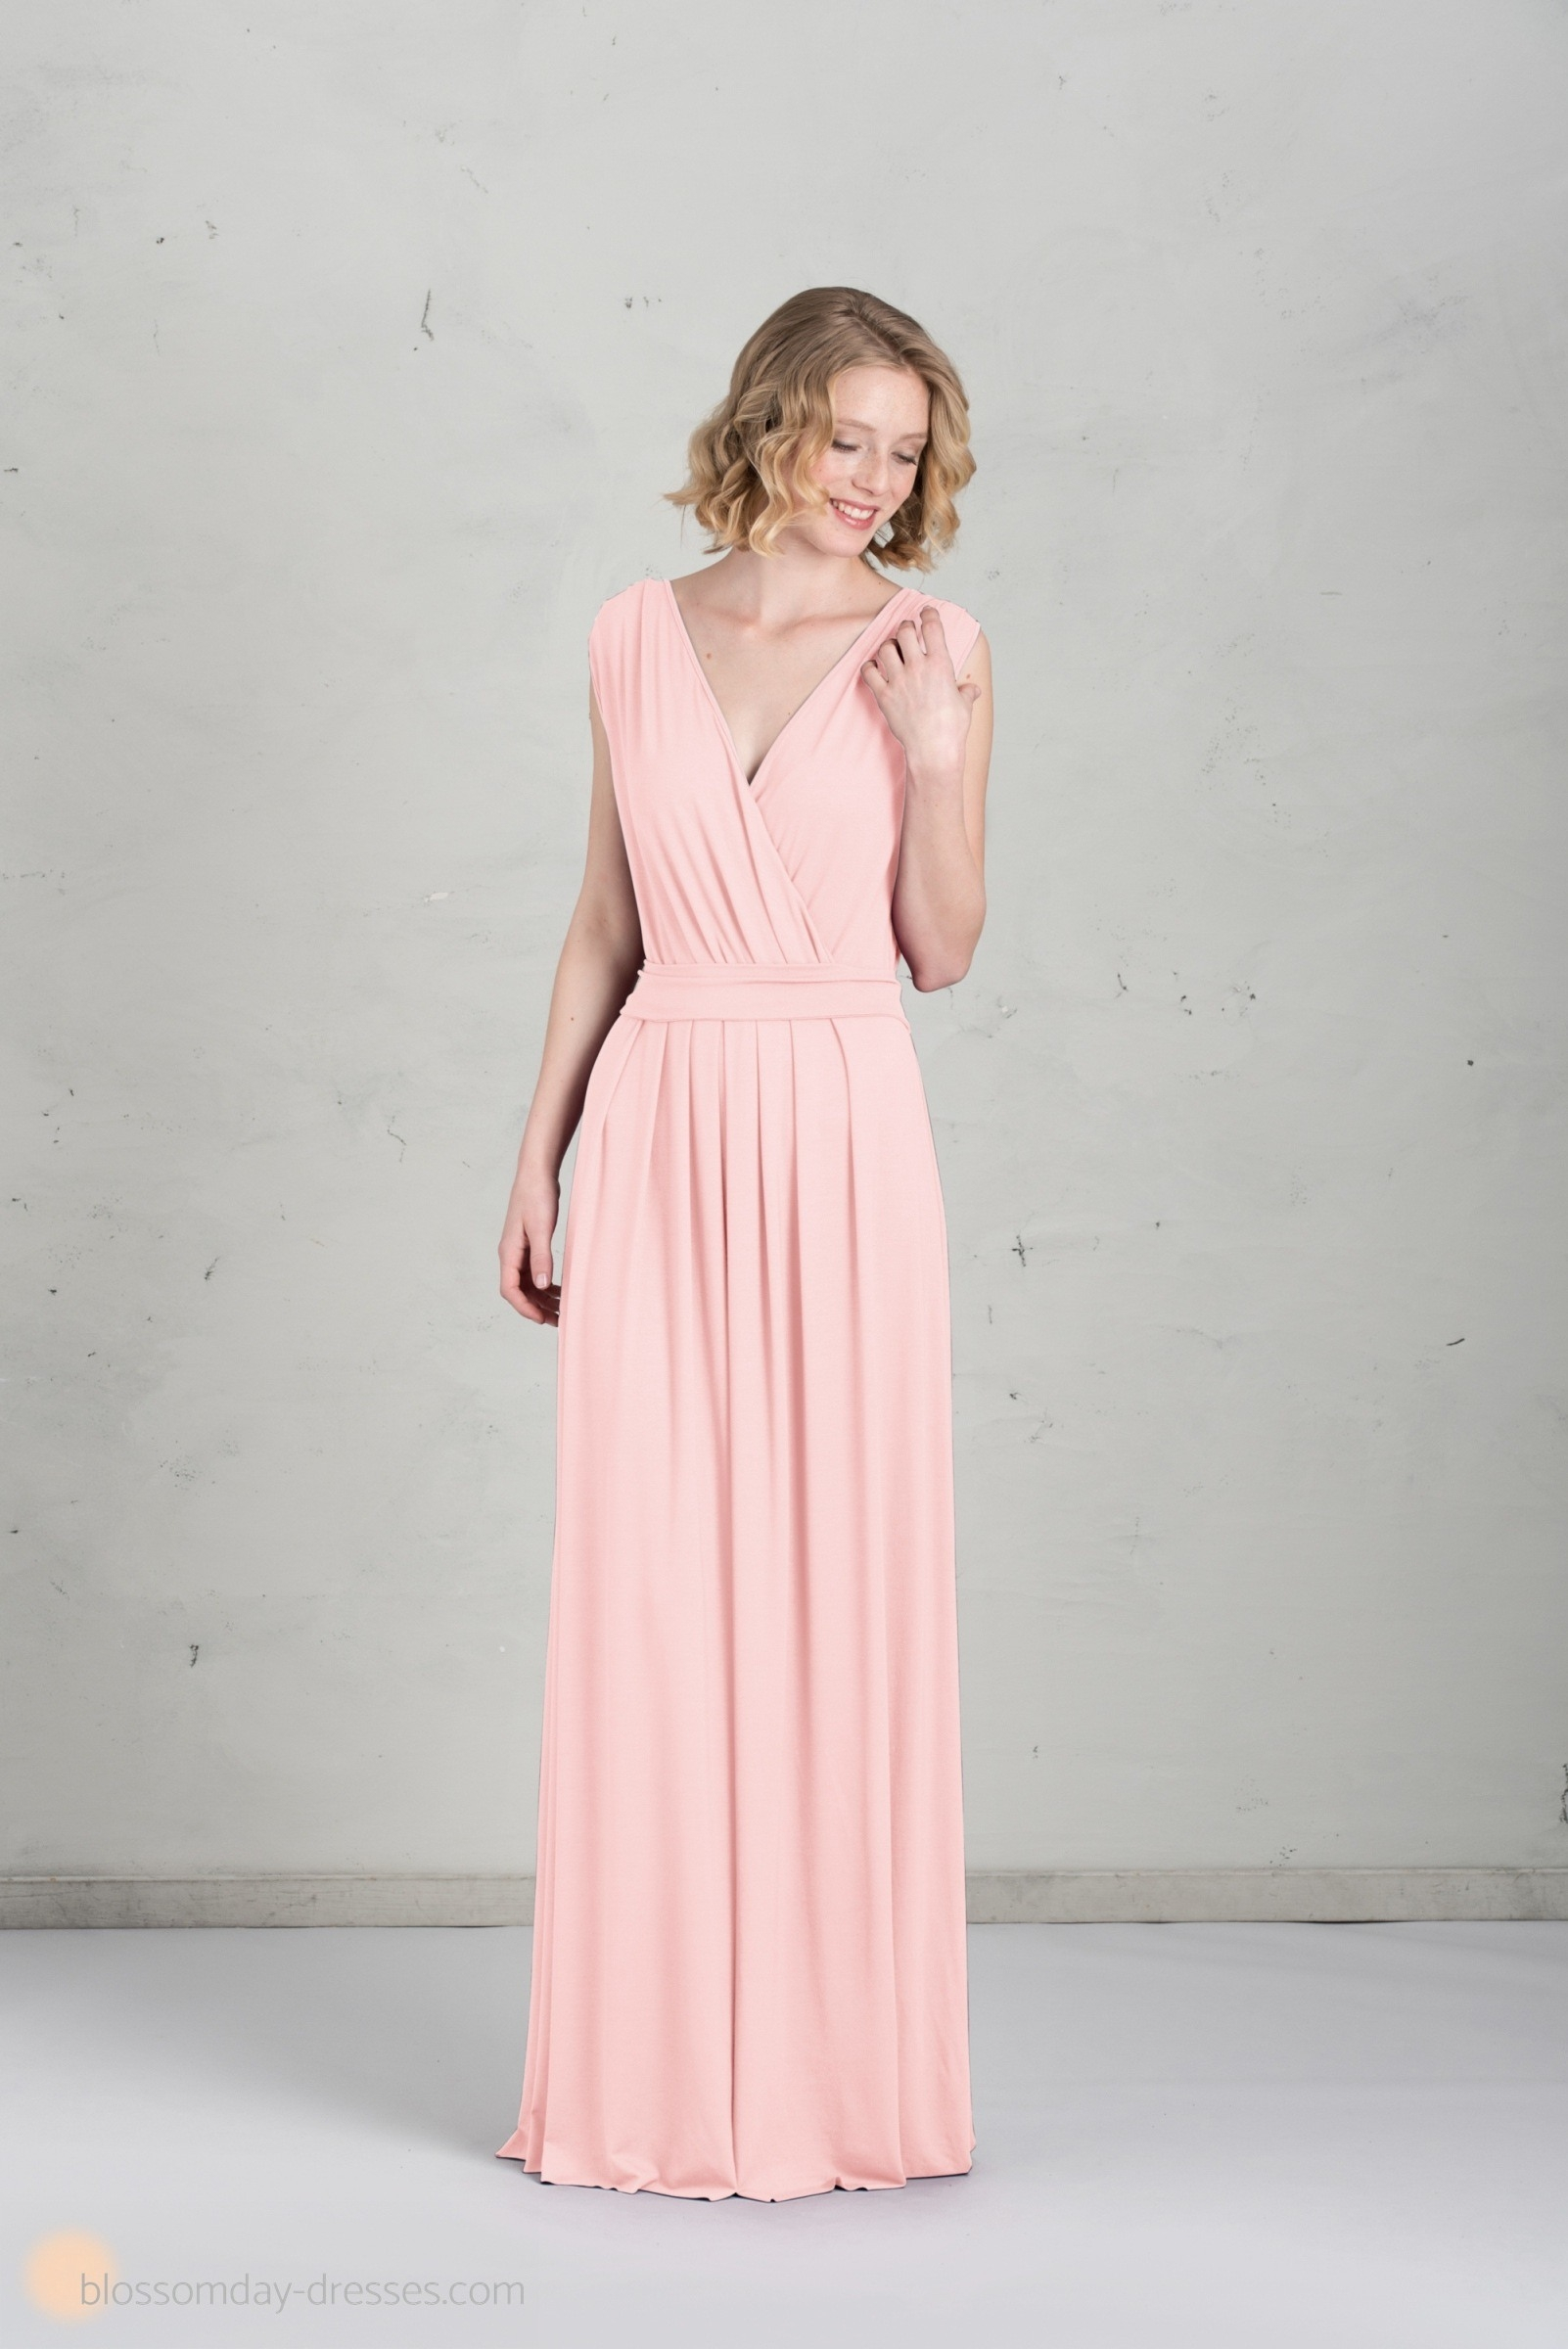 Luxus Kleid Altrosa Lang SpezialgebietFormal Genial Kleid Altrosa Lang Design